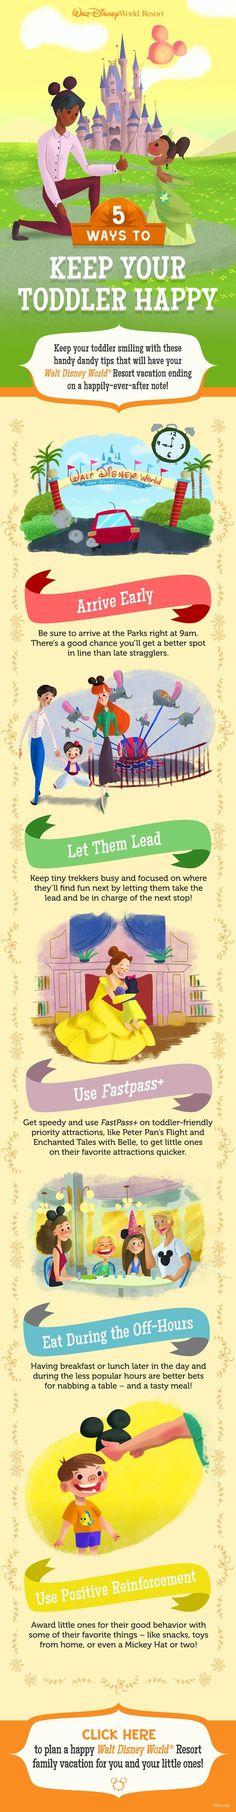 5 ways to keep your toddler happy at Walt Disney World!    Disney Vacation…